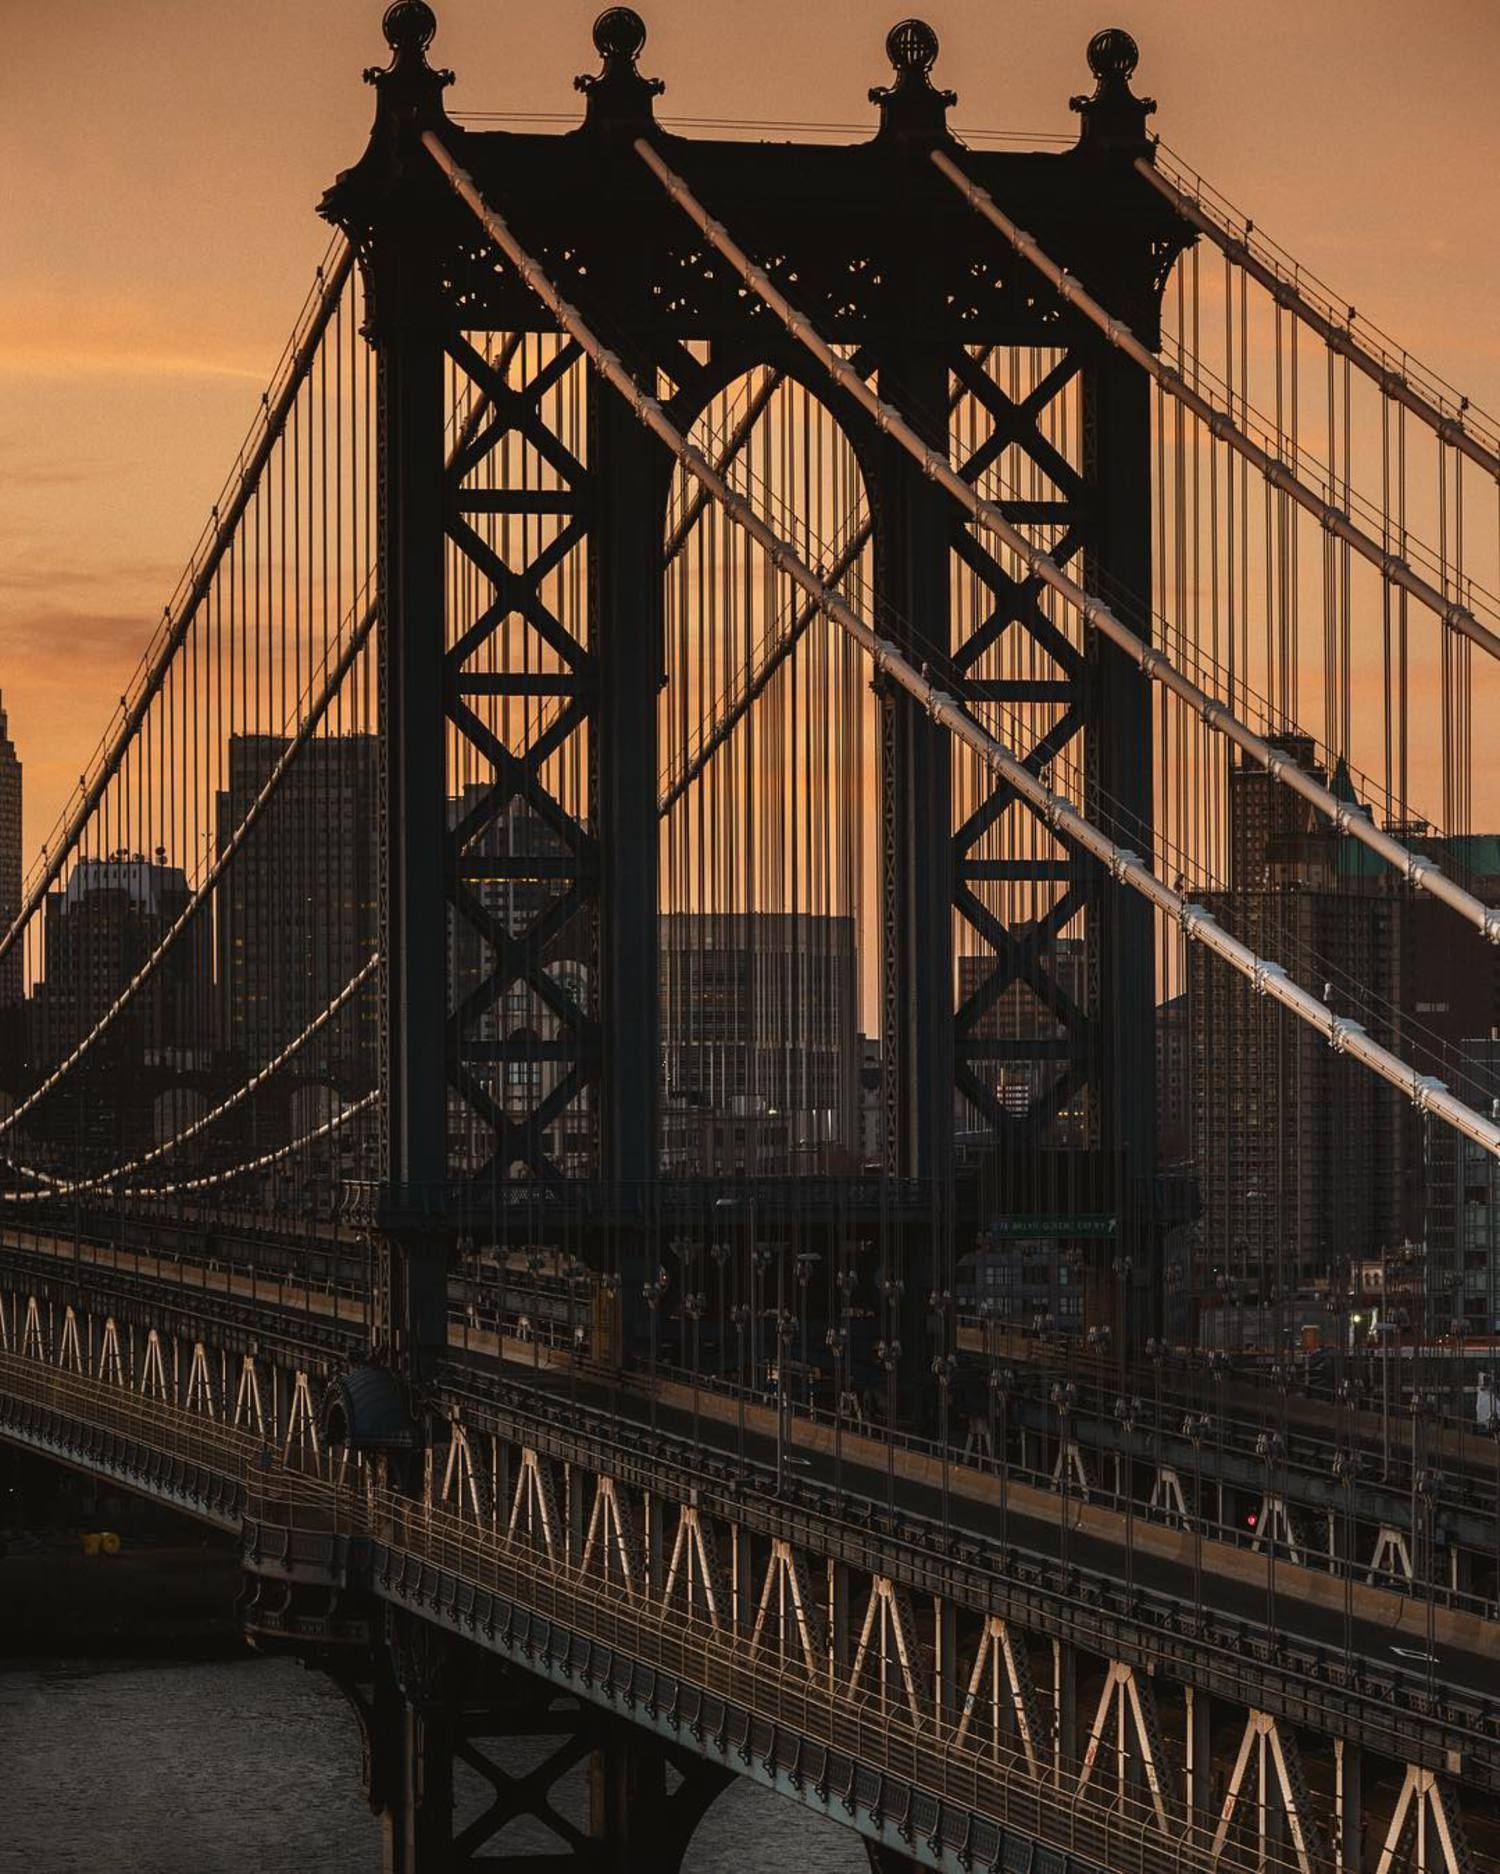 New light 🌅 w/ @kingy_kings @killakristennn @nyctme @phives @raluca305  ISO 1000 / 105mm f2.8 lens / F9 / 1/250sec / D4s        #nycprimeshot#icapture_nyc#iloveny#ig_nycity#igersofnyc#abc7ny #instagramnyc#imagesofnyc#nbc4ny#thisisnewyorkcity#city_of_newyork #vsconyc#newyork_instagram#wildnewyork#gf_nyc#nycdotgram#nydngram#made_in_ny#new_york_city_photo#nybynewyorkers#simply_newyork#nypix#topnewyorkphoto#seeyourcity#new_york_shots